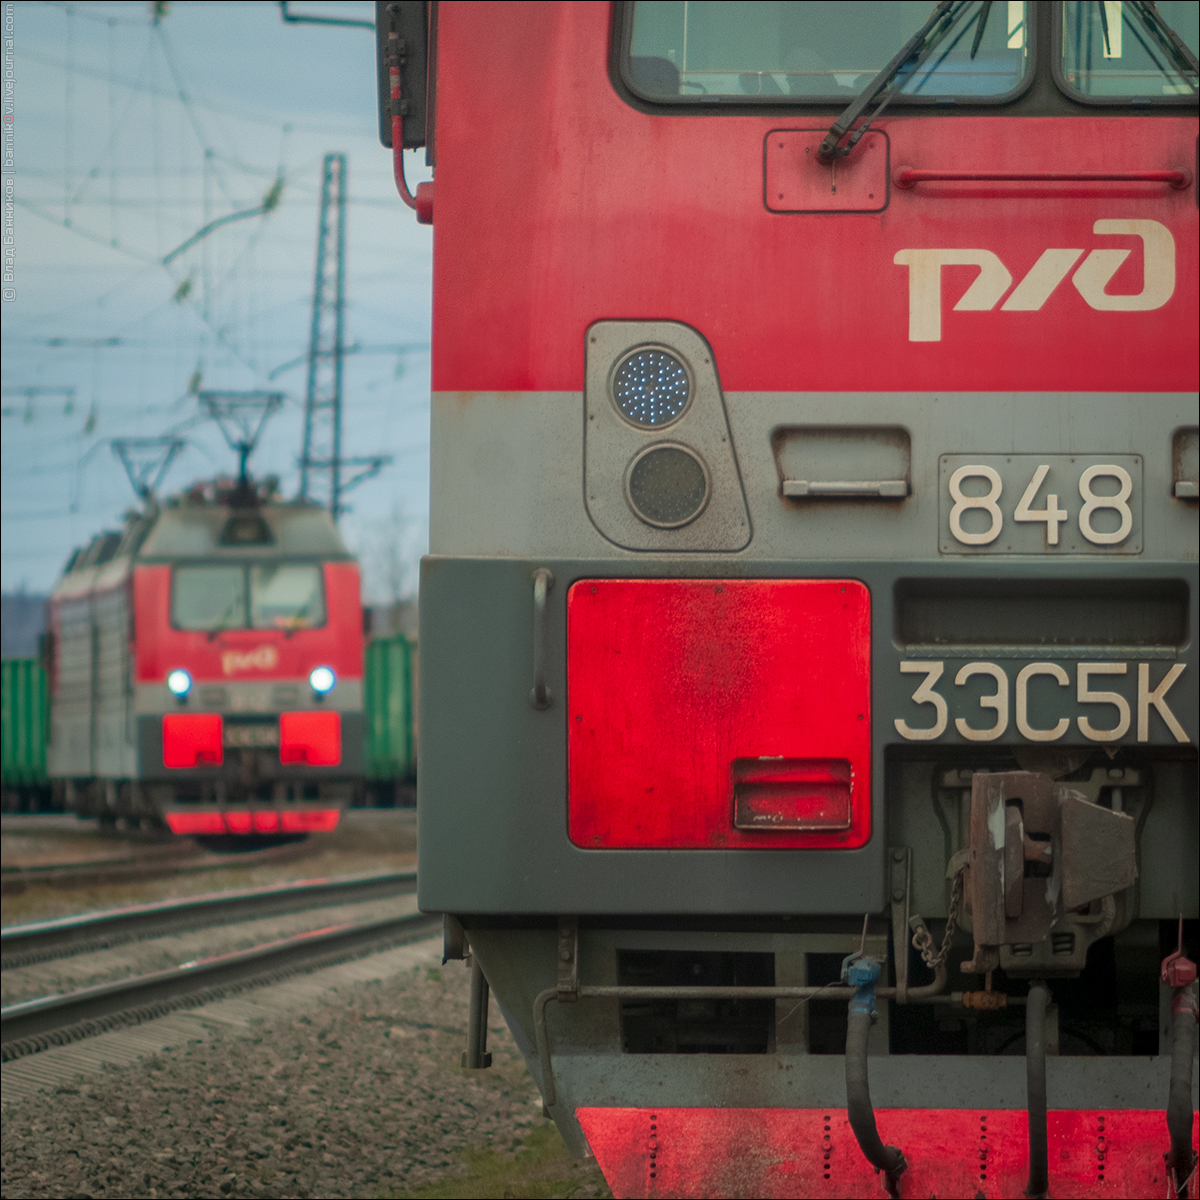 VSB_4310-HDR_inst